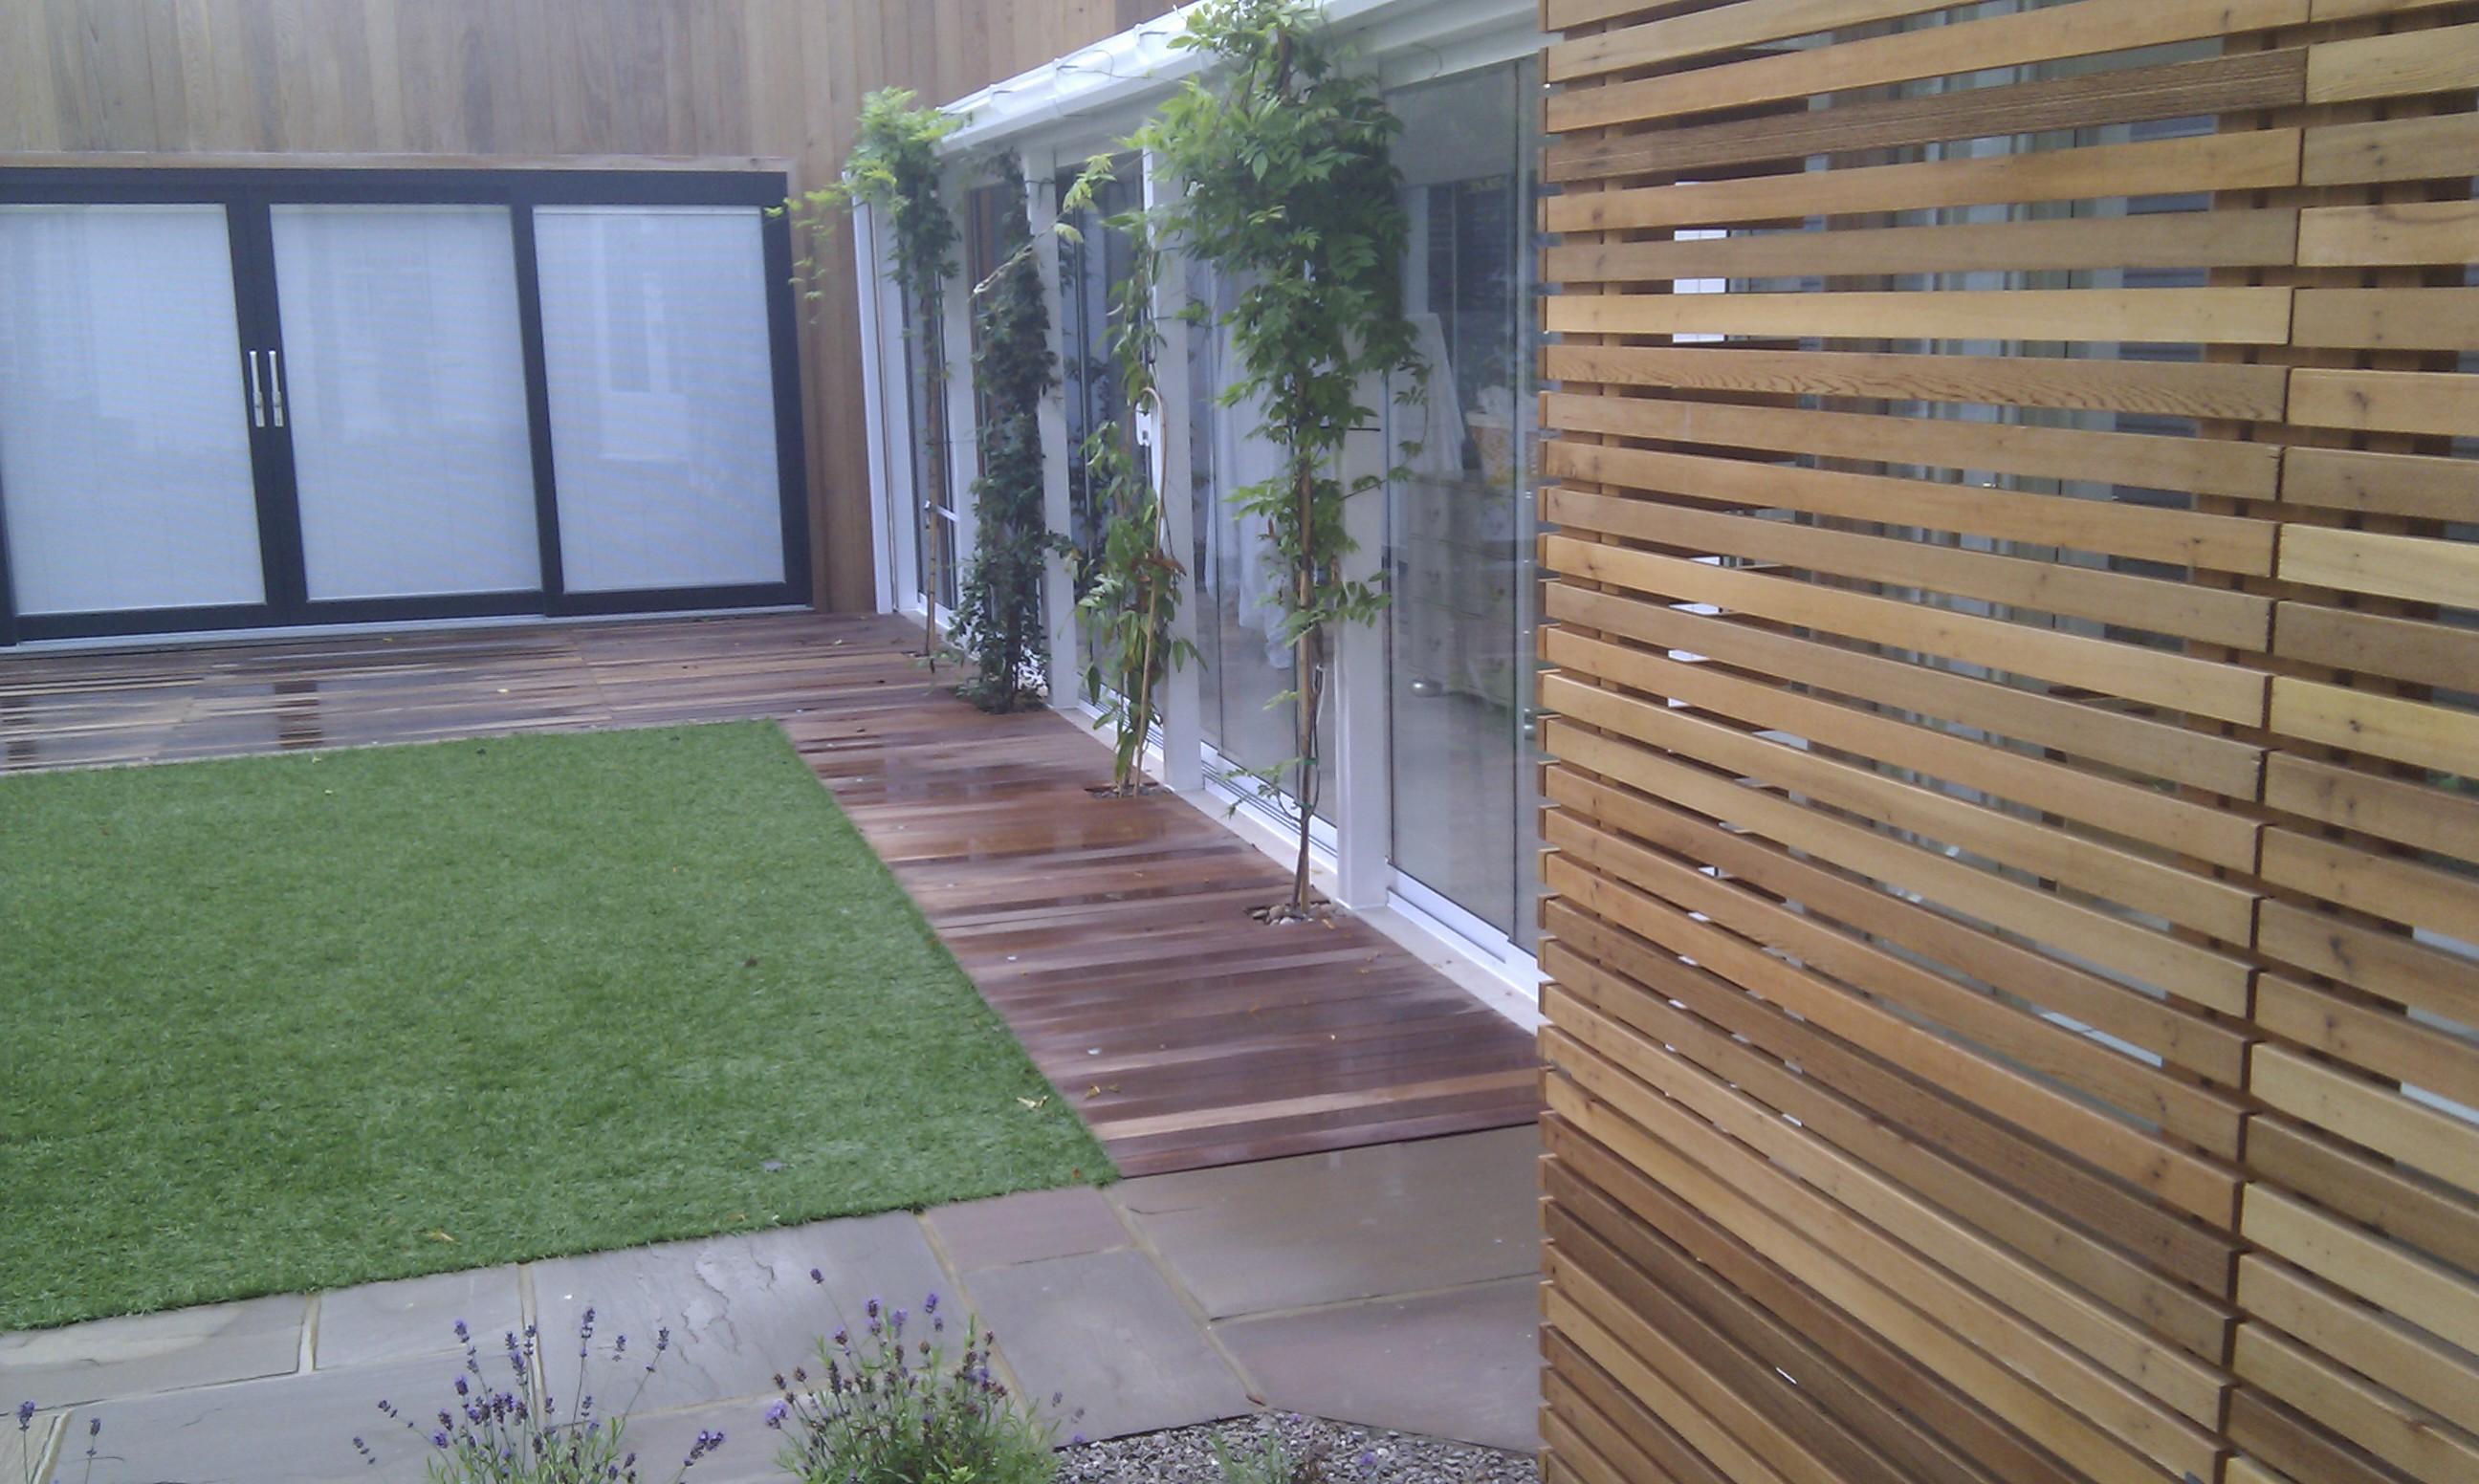 modern garden design london slatted grey privacy screen sandstone paving easy grass balau hardwood decking (24)